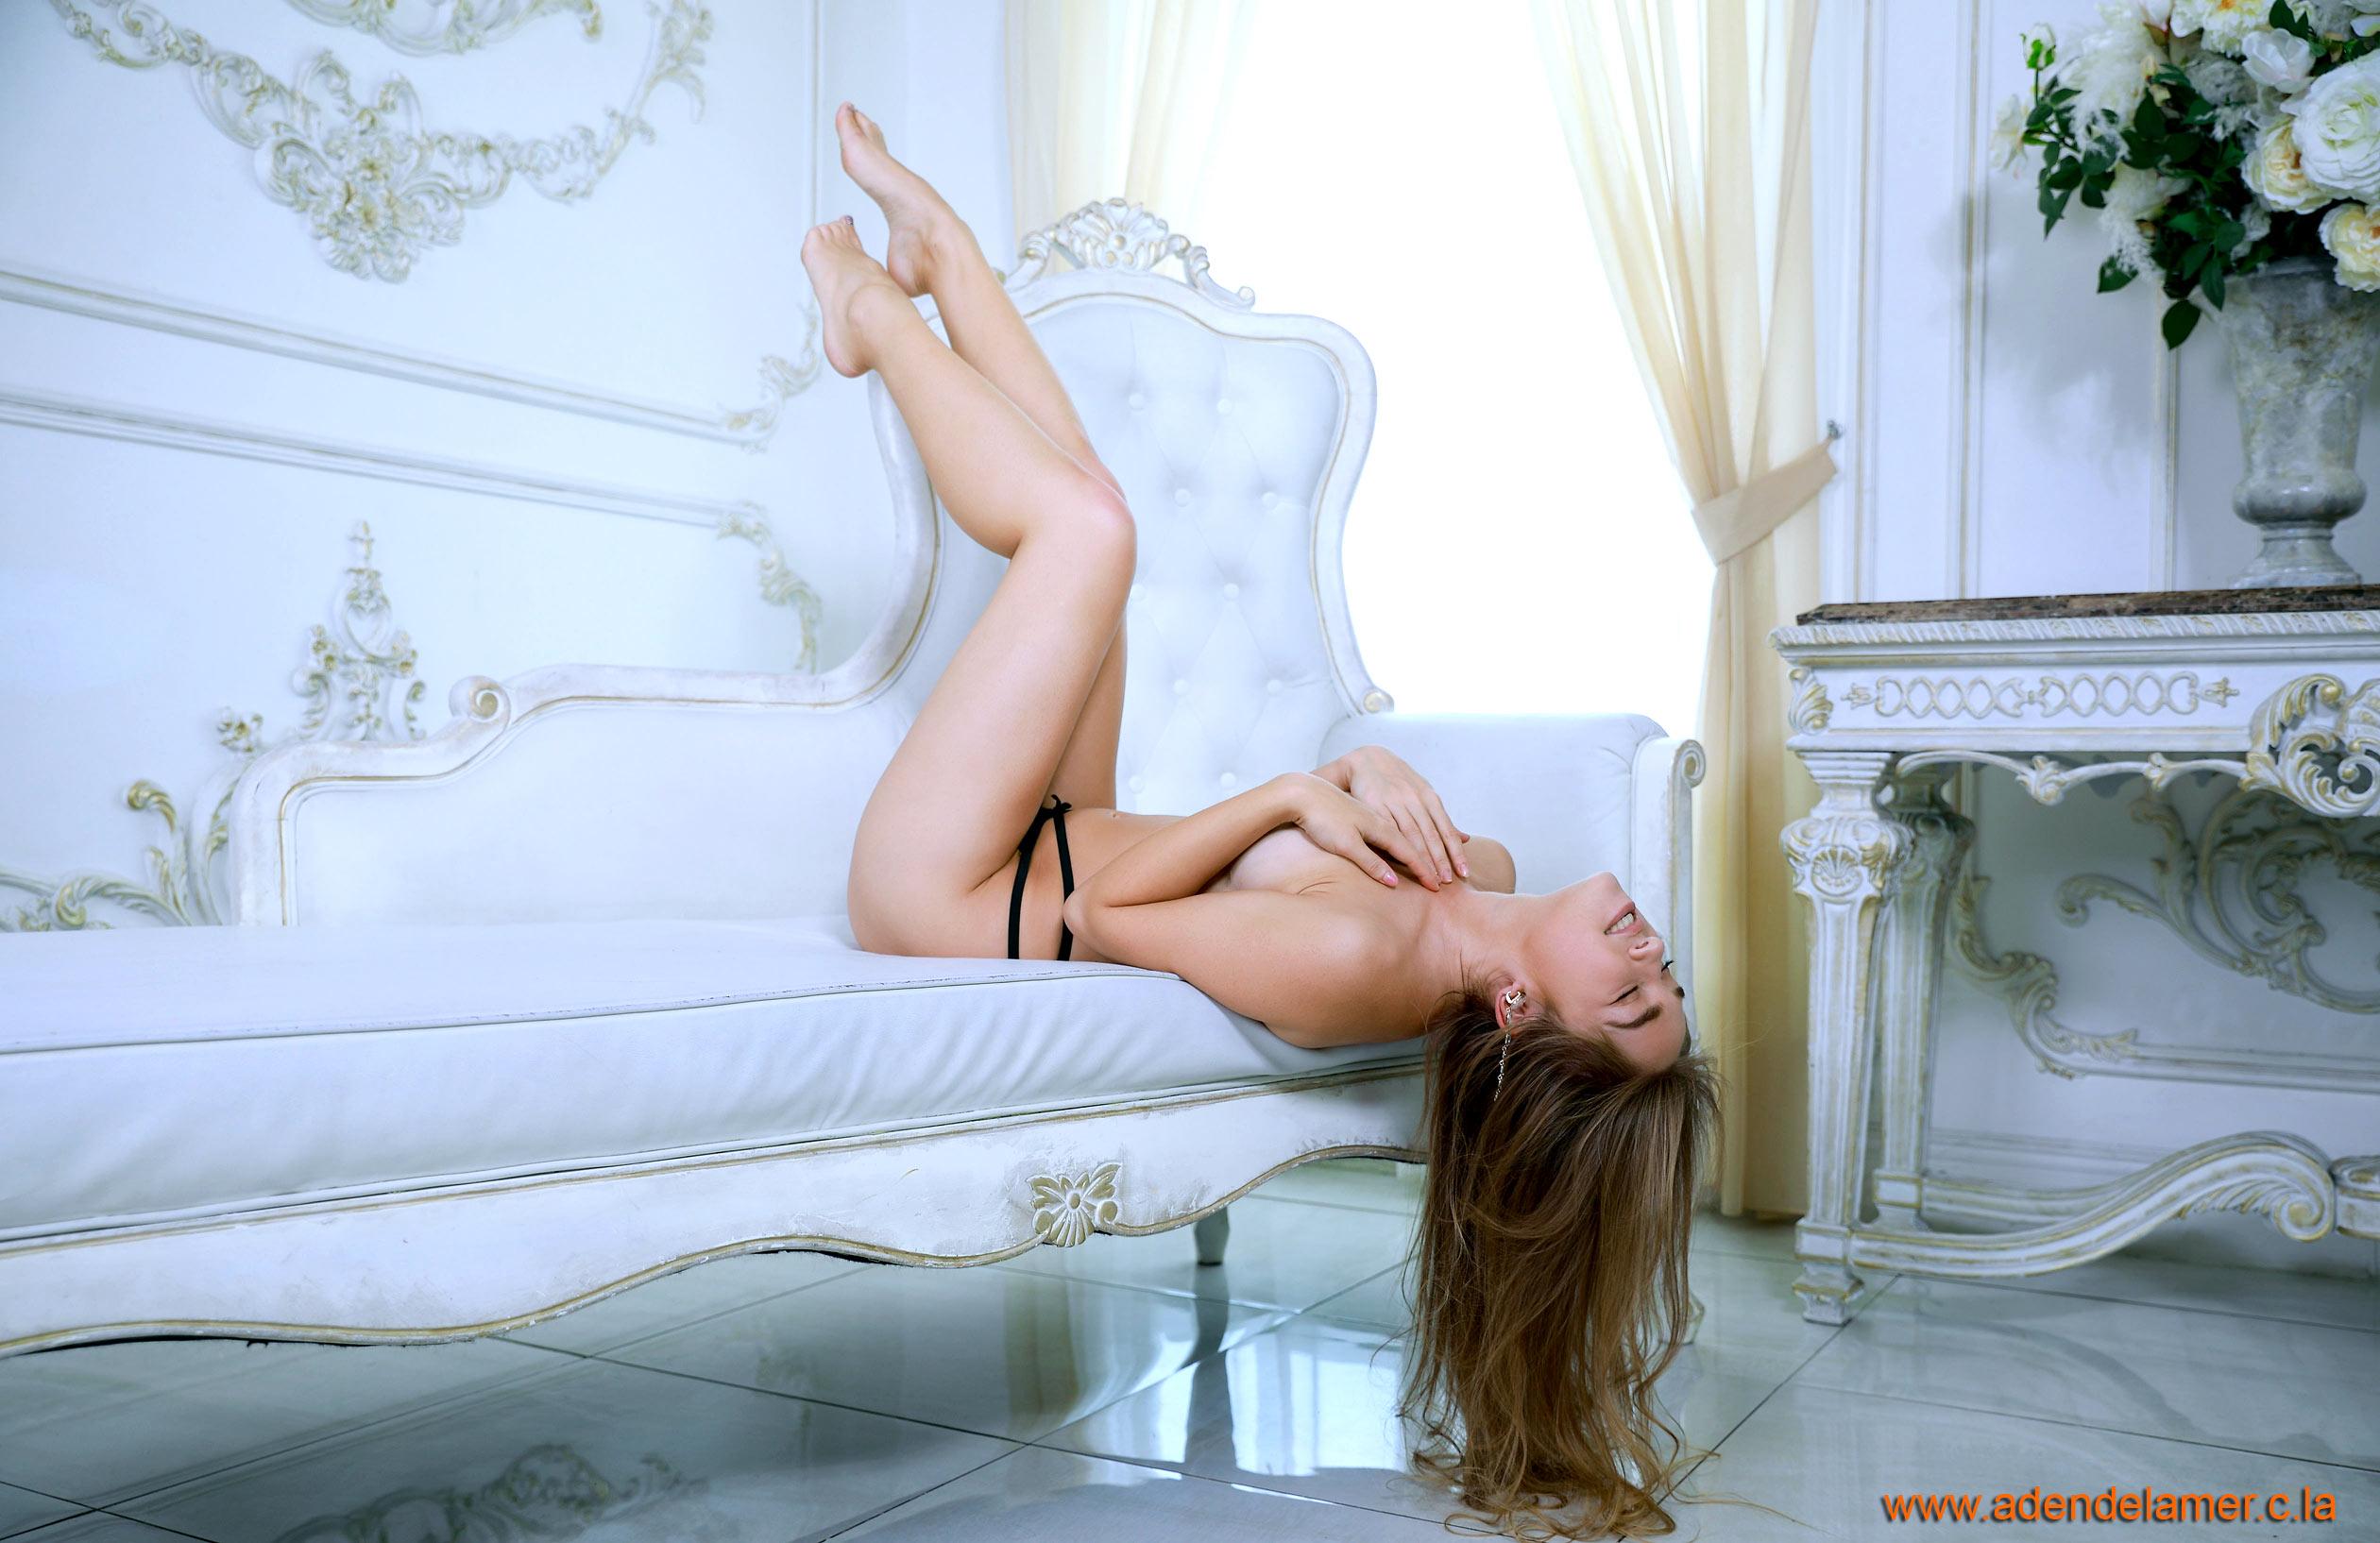 http://laurent.jamair.free.fr/Vrac2020/810/images/048.jpg